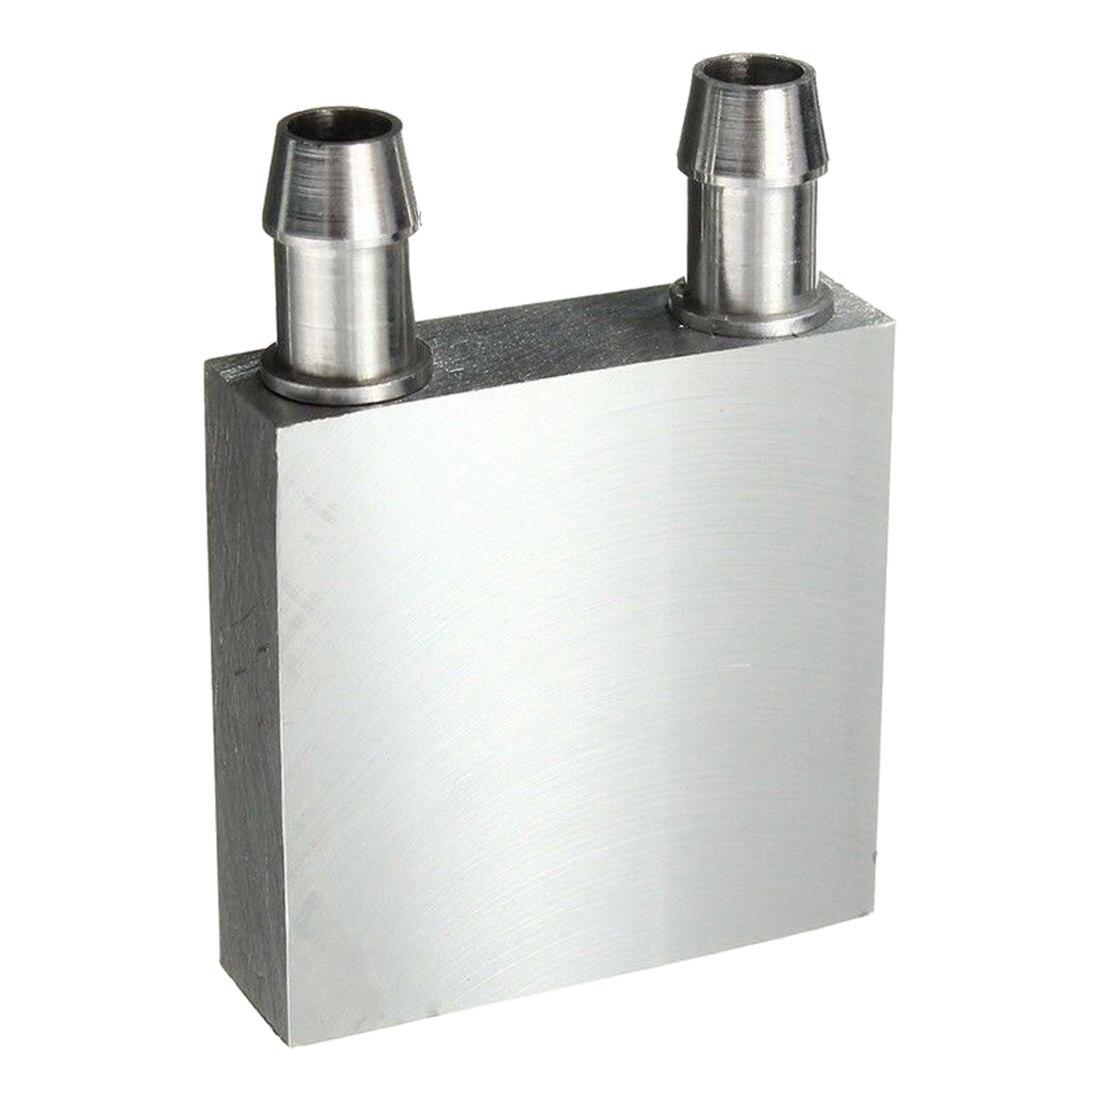 40x40x12mm Aluminum Water Liquid Cooler Block Heatsink For Computer CPU Radiator new 41 x 122 x 12mm water cooling heatsink block waterblock liquid cooler vacuum aluminum brazing heatsink cooler for cpu gpu